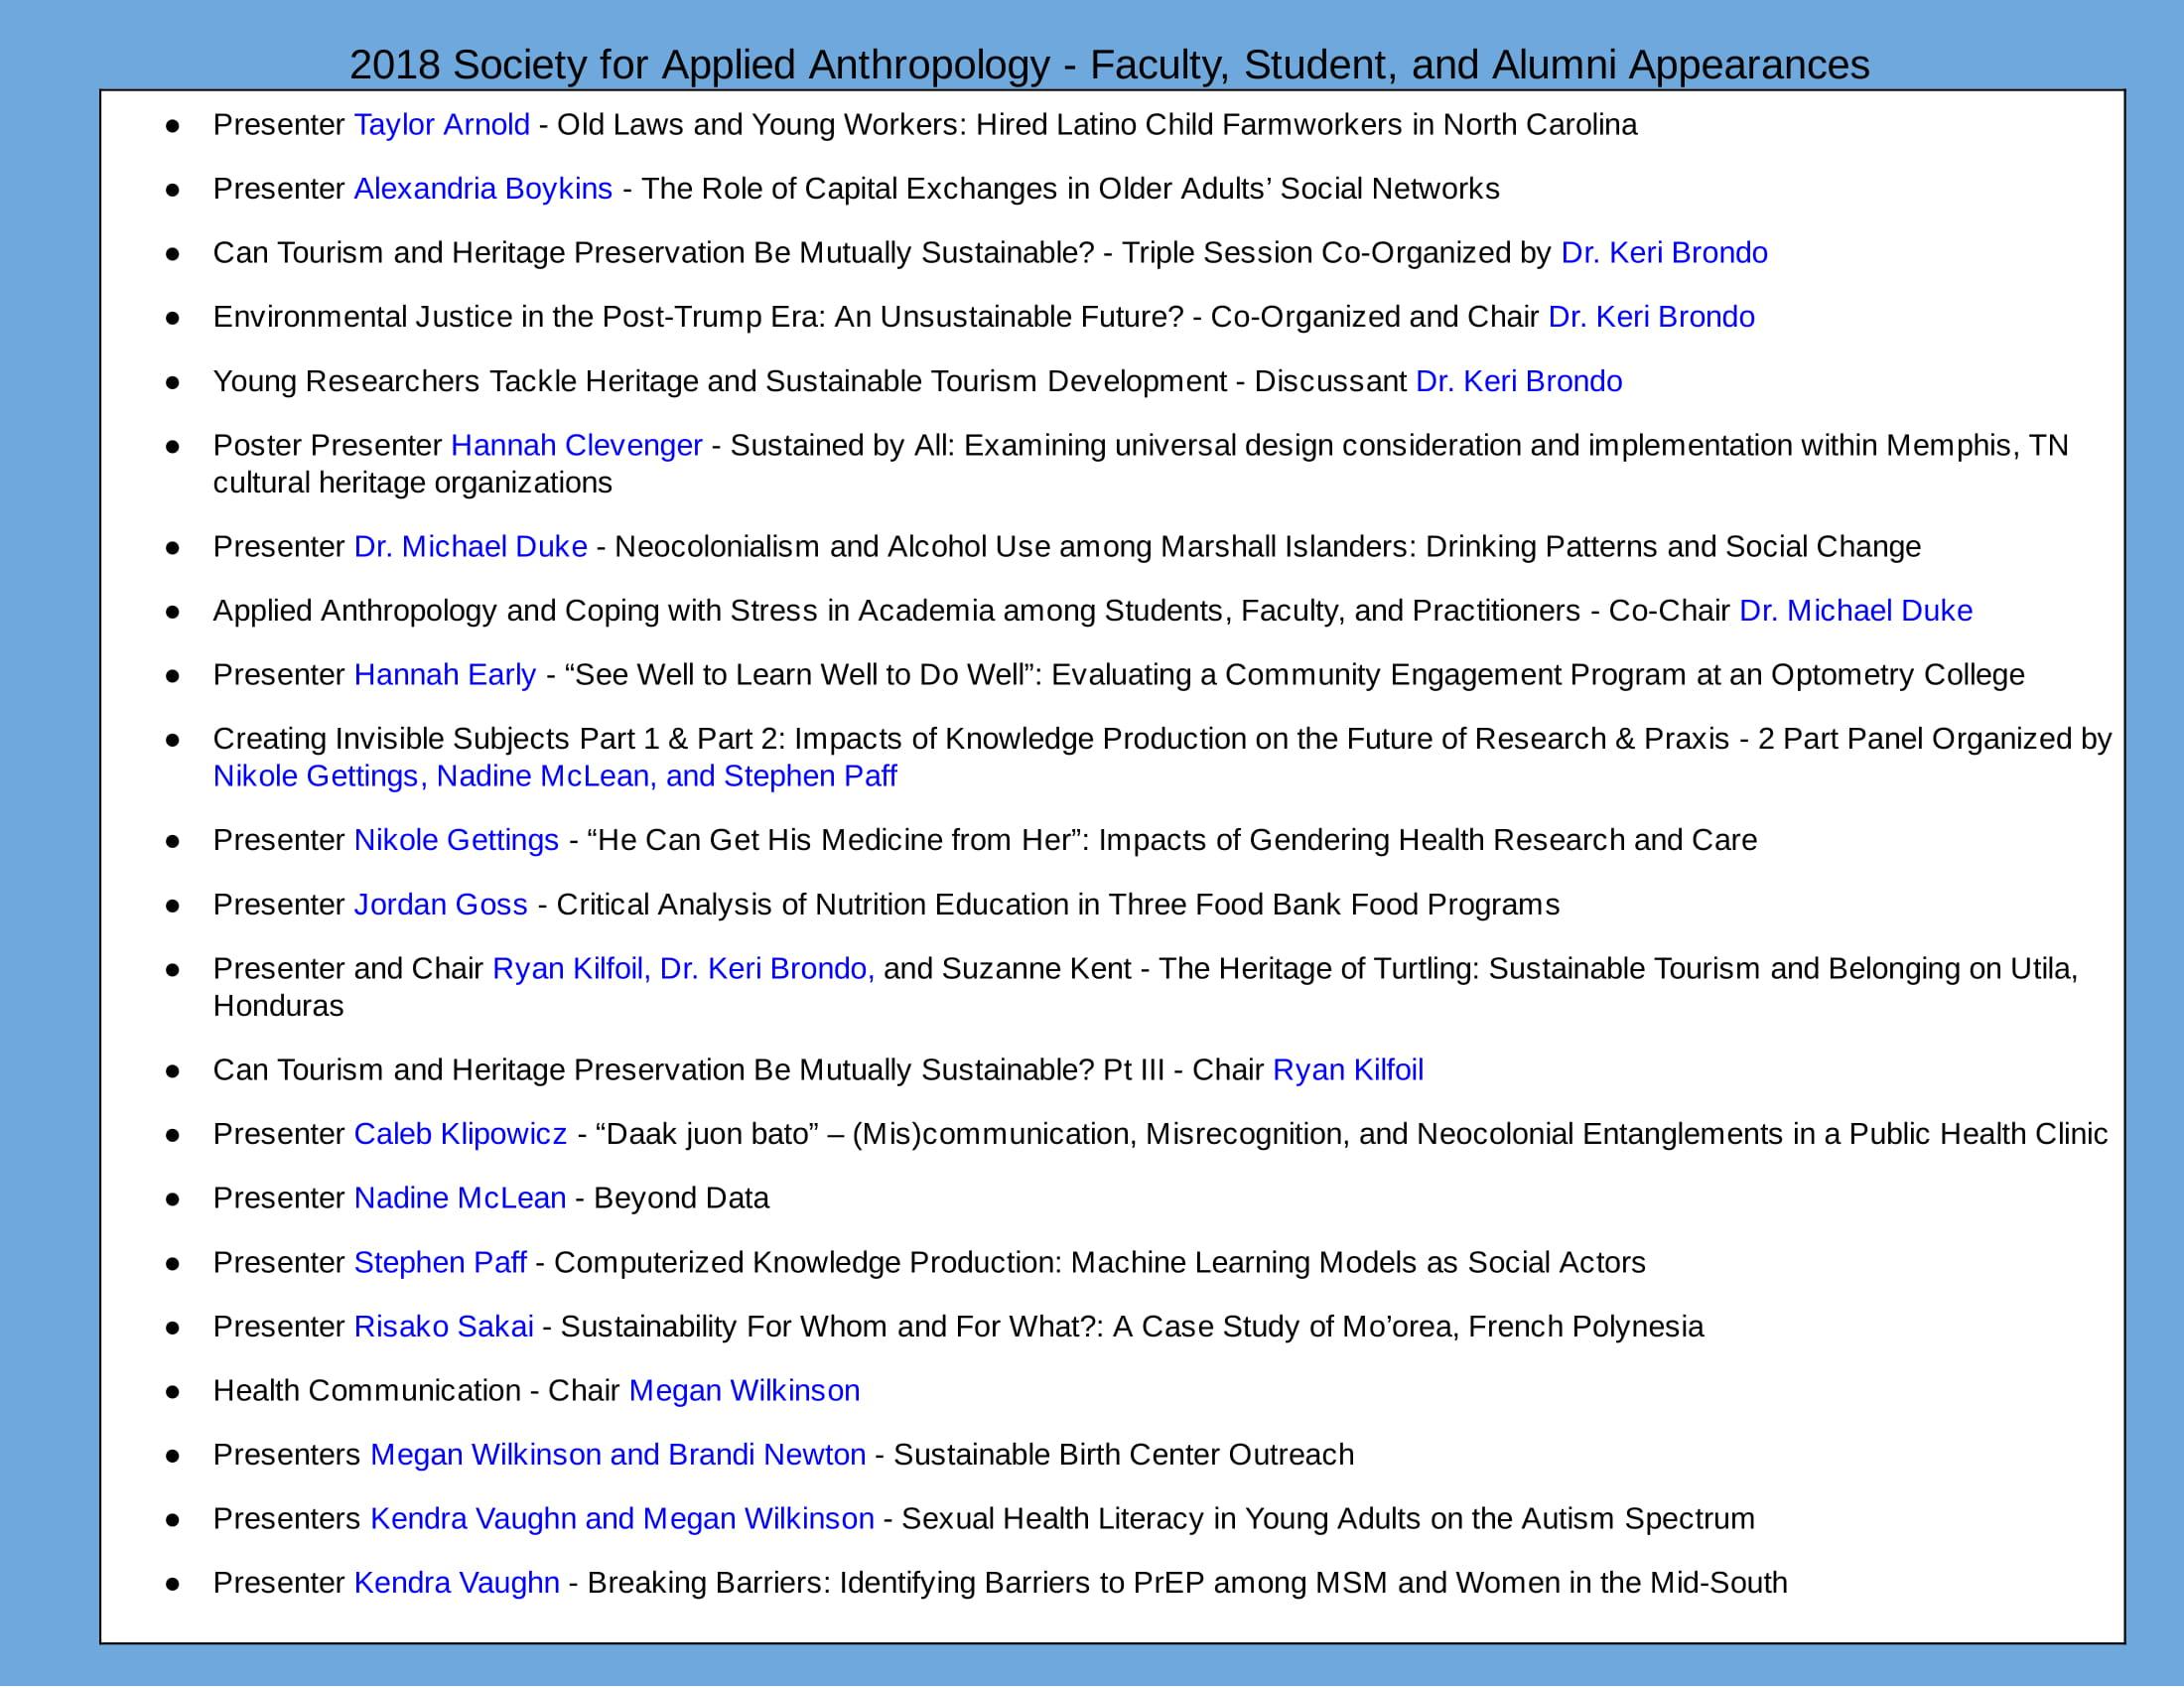 2018 SfAA List